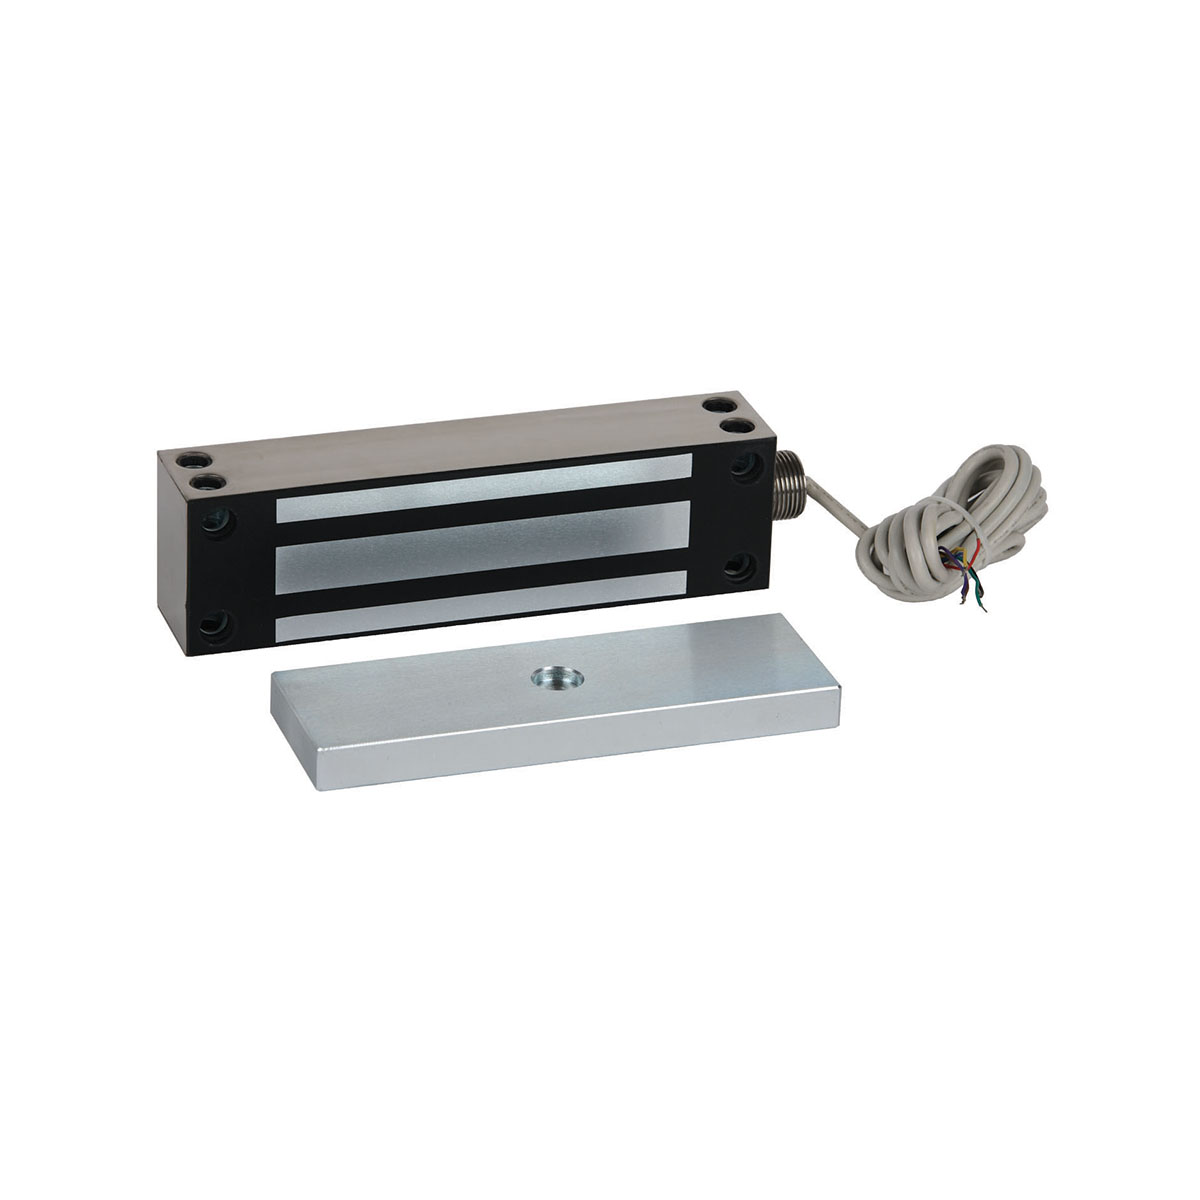 8380 GateMag - Electromagnetic Locks (RCI) | dormakaba on